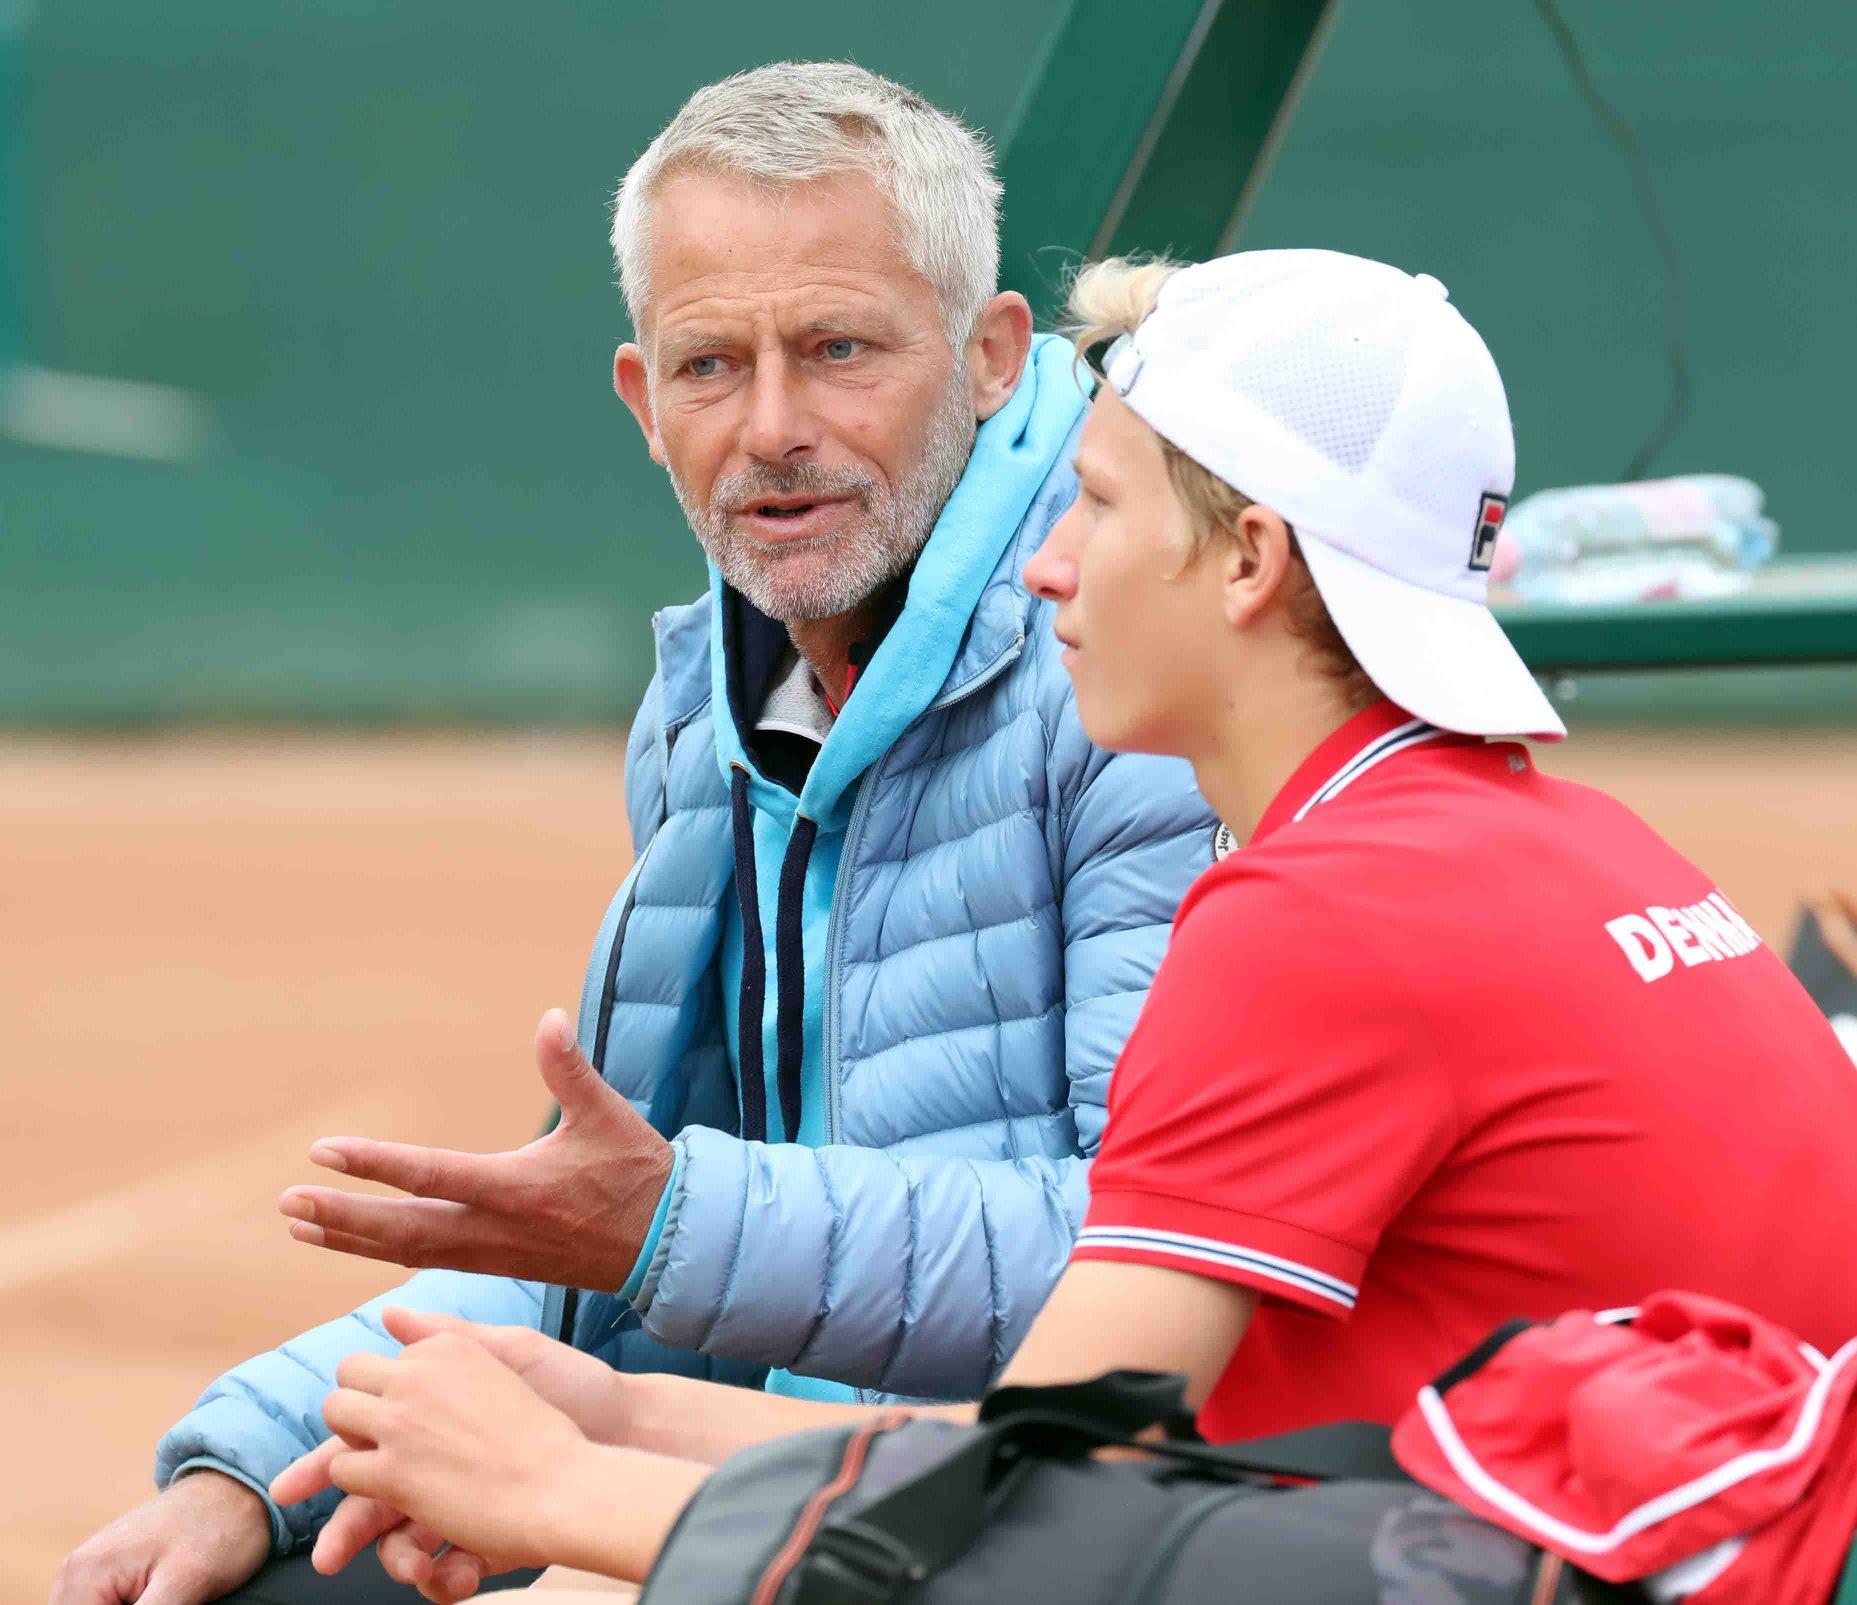 Junior Davis Cup 2018